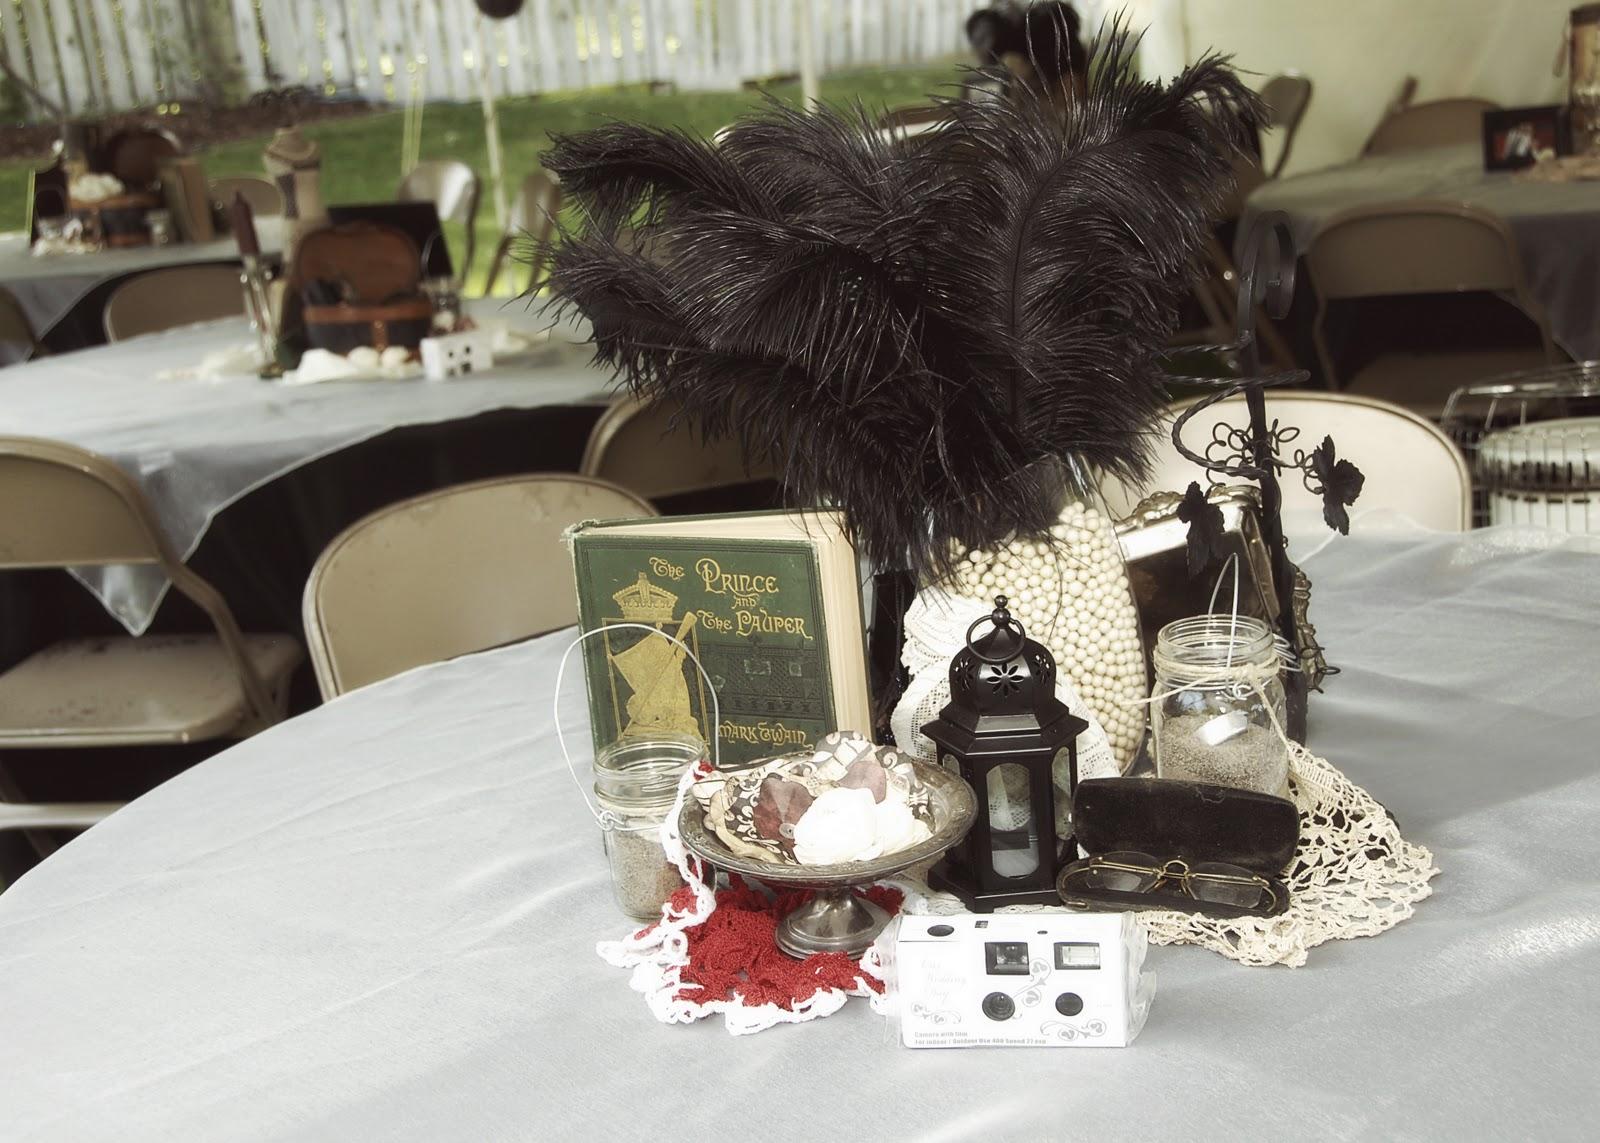 Sweet georgia brown s weddings vintage wedding centrepieces